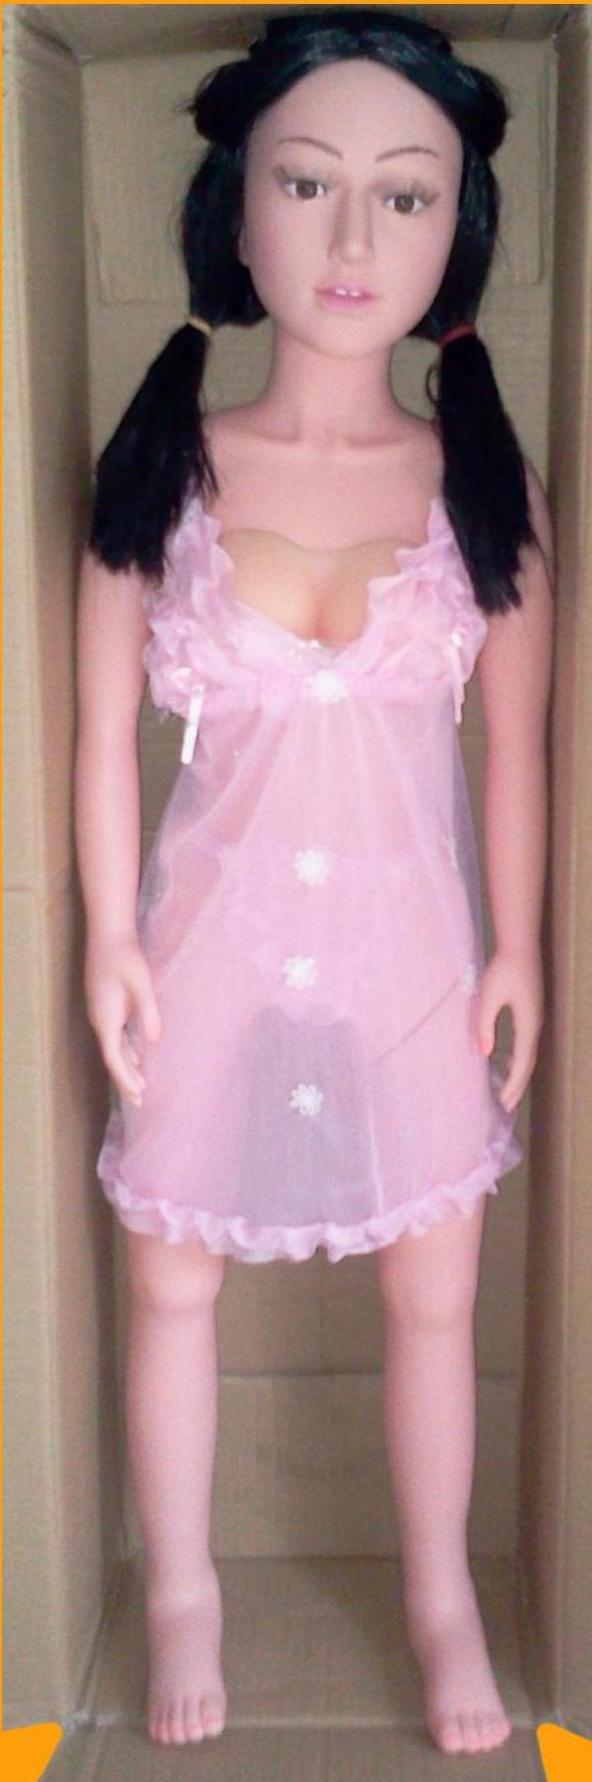 asian-barbie-sex-doll